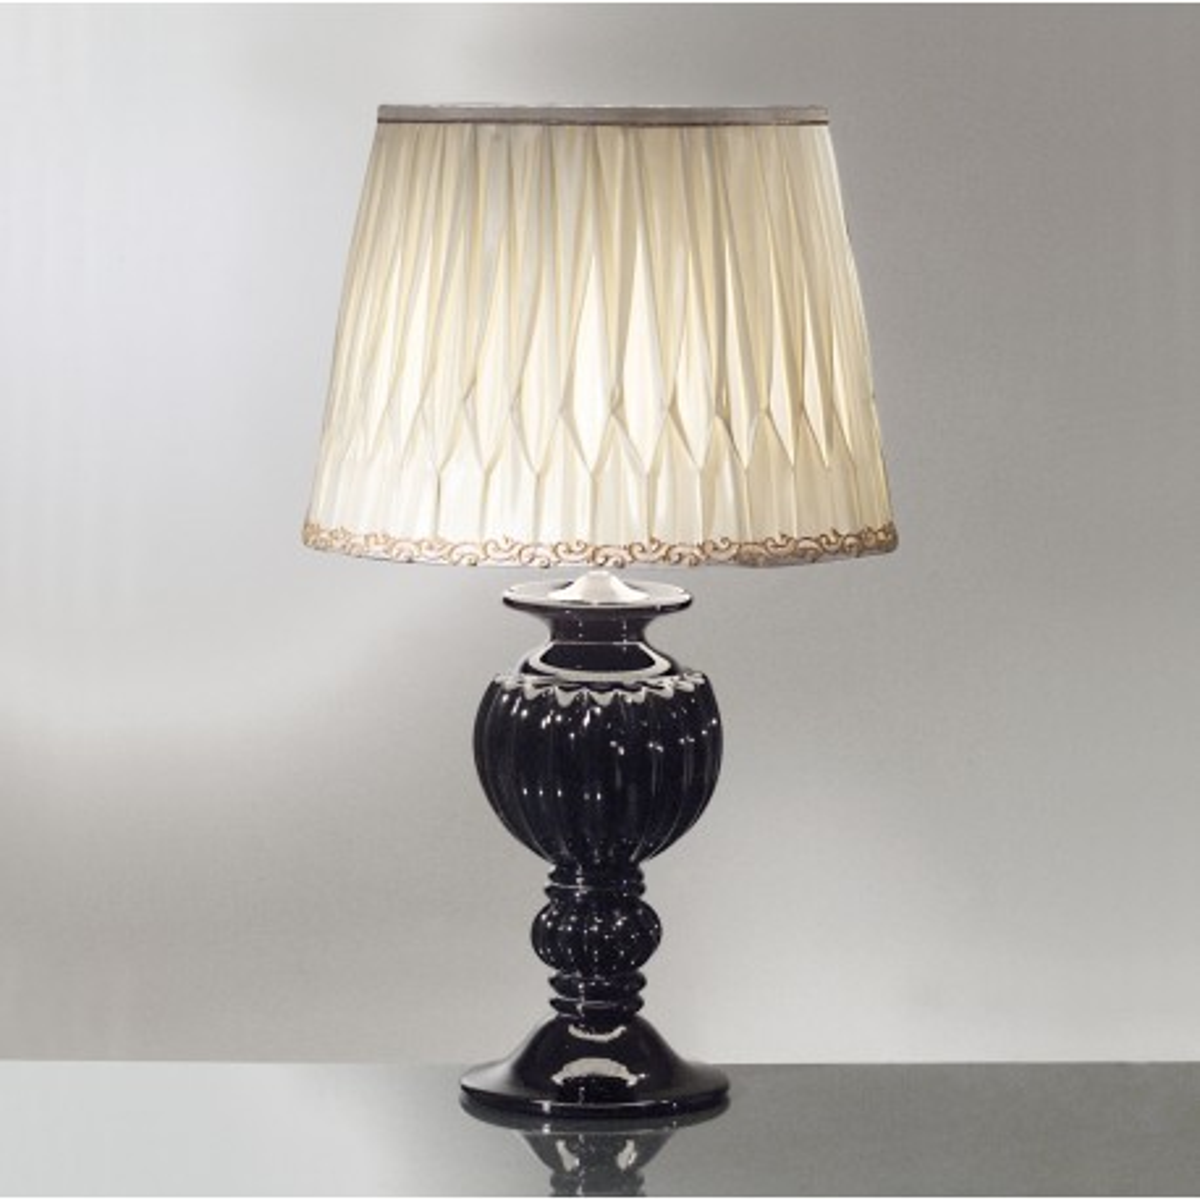 tersicore lampe de table en verre de murano murano. Black Bedroom Furniture Sets. Home Design Ideas